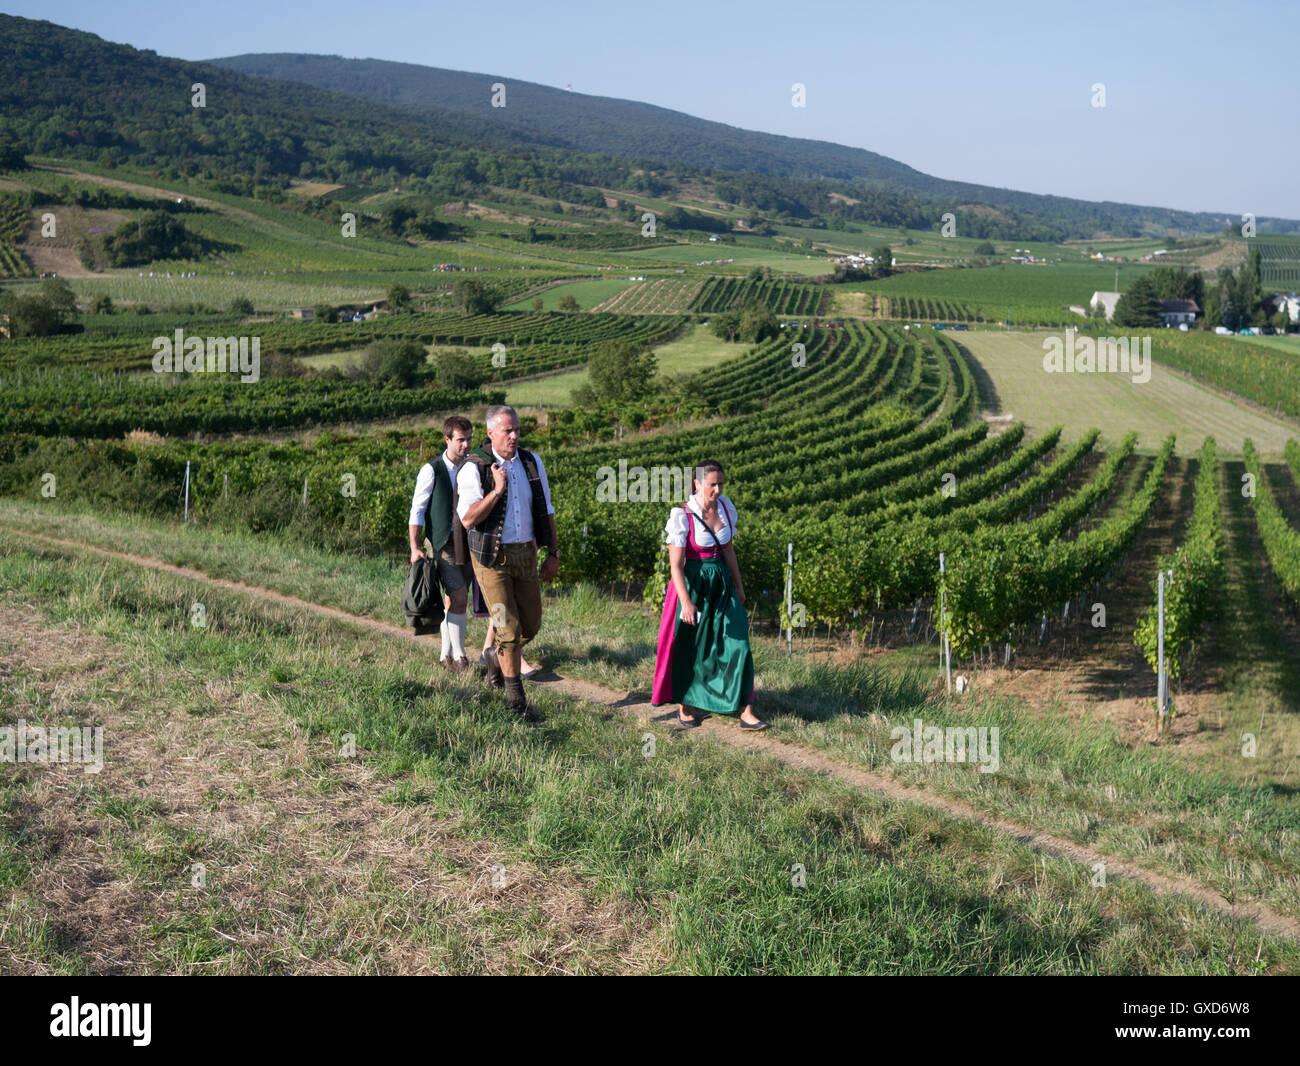 The Genussmeile harvest festival near Vienna, Austria Stock Photo